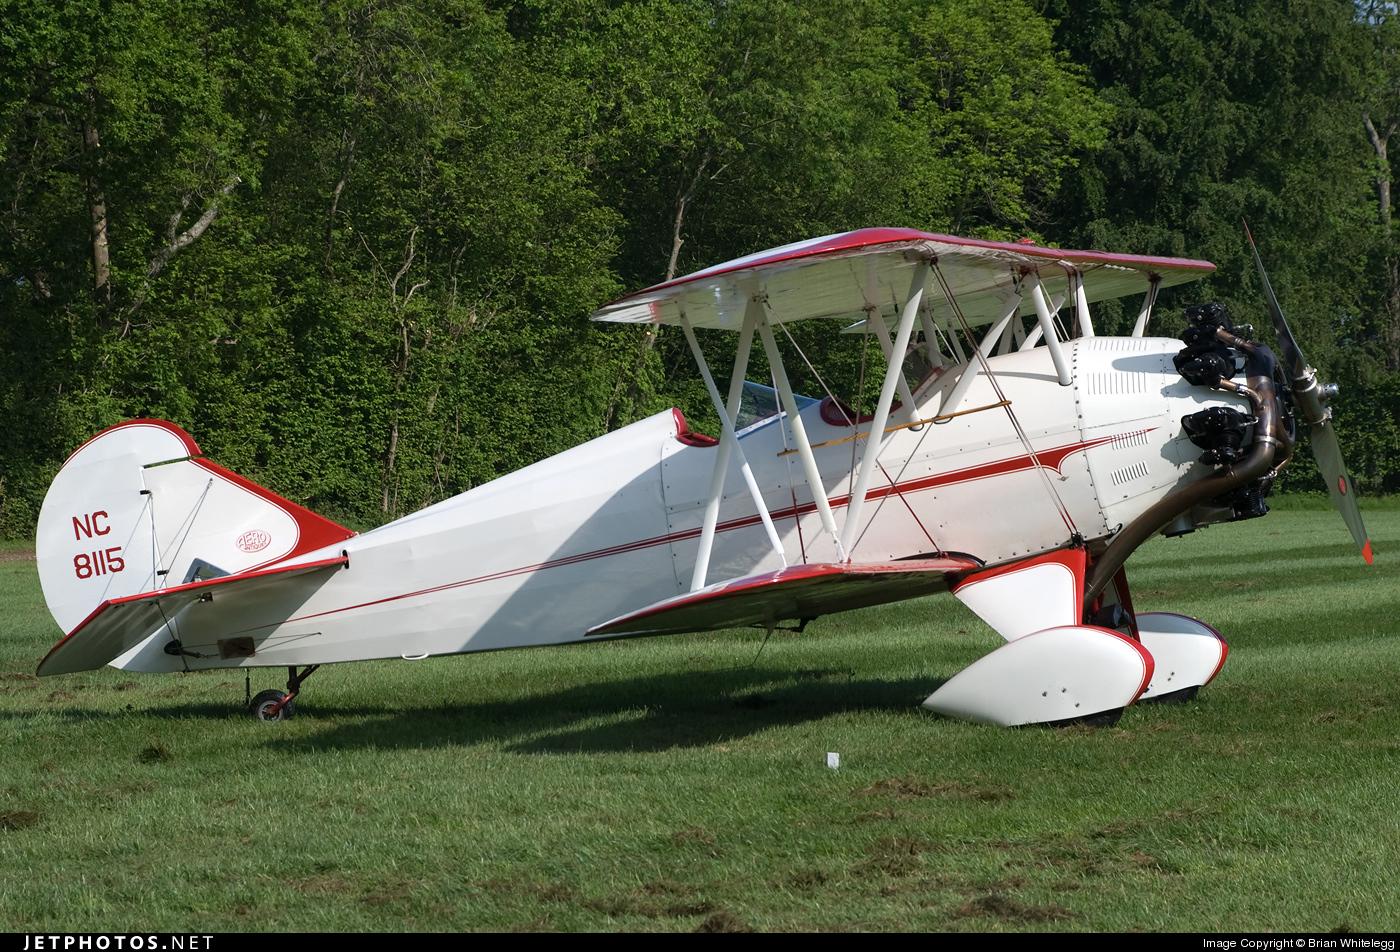 NC8115 - Curtiss-Wright Travel Air 4000 - Private